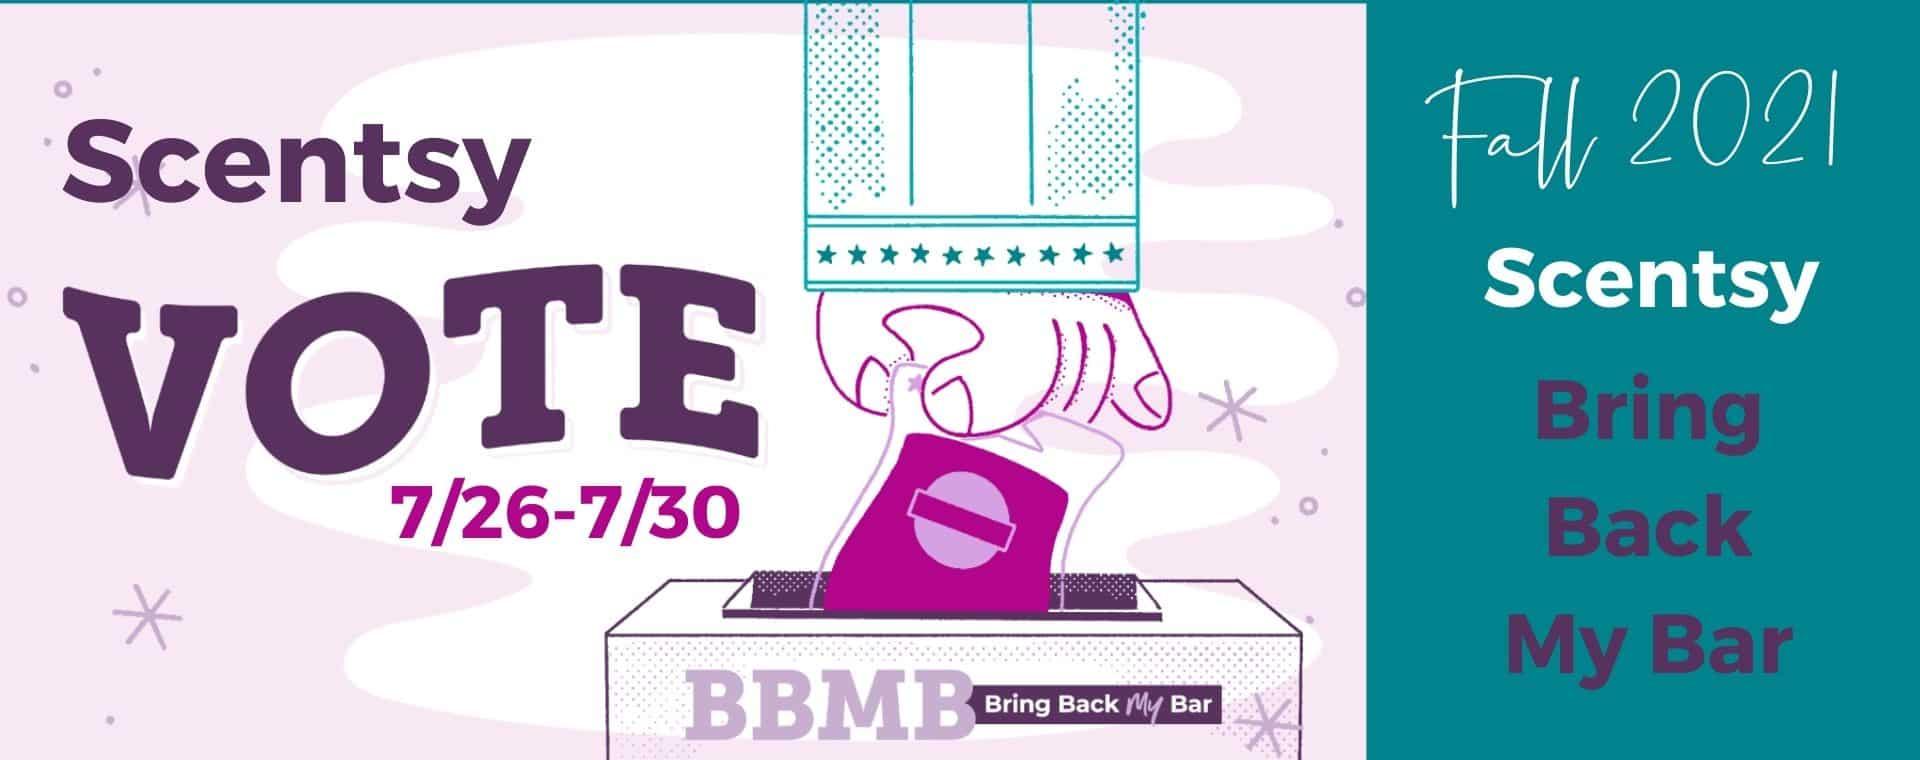 Scentsy Bring Back my Bar Vote 2021